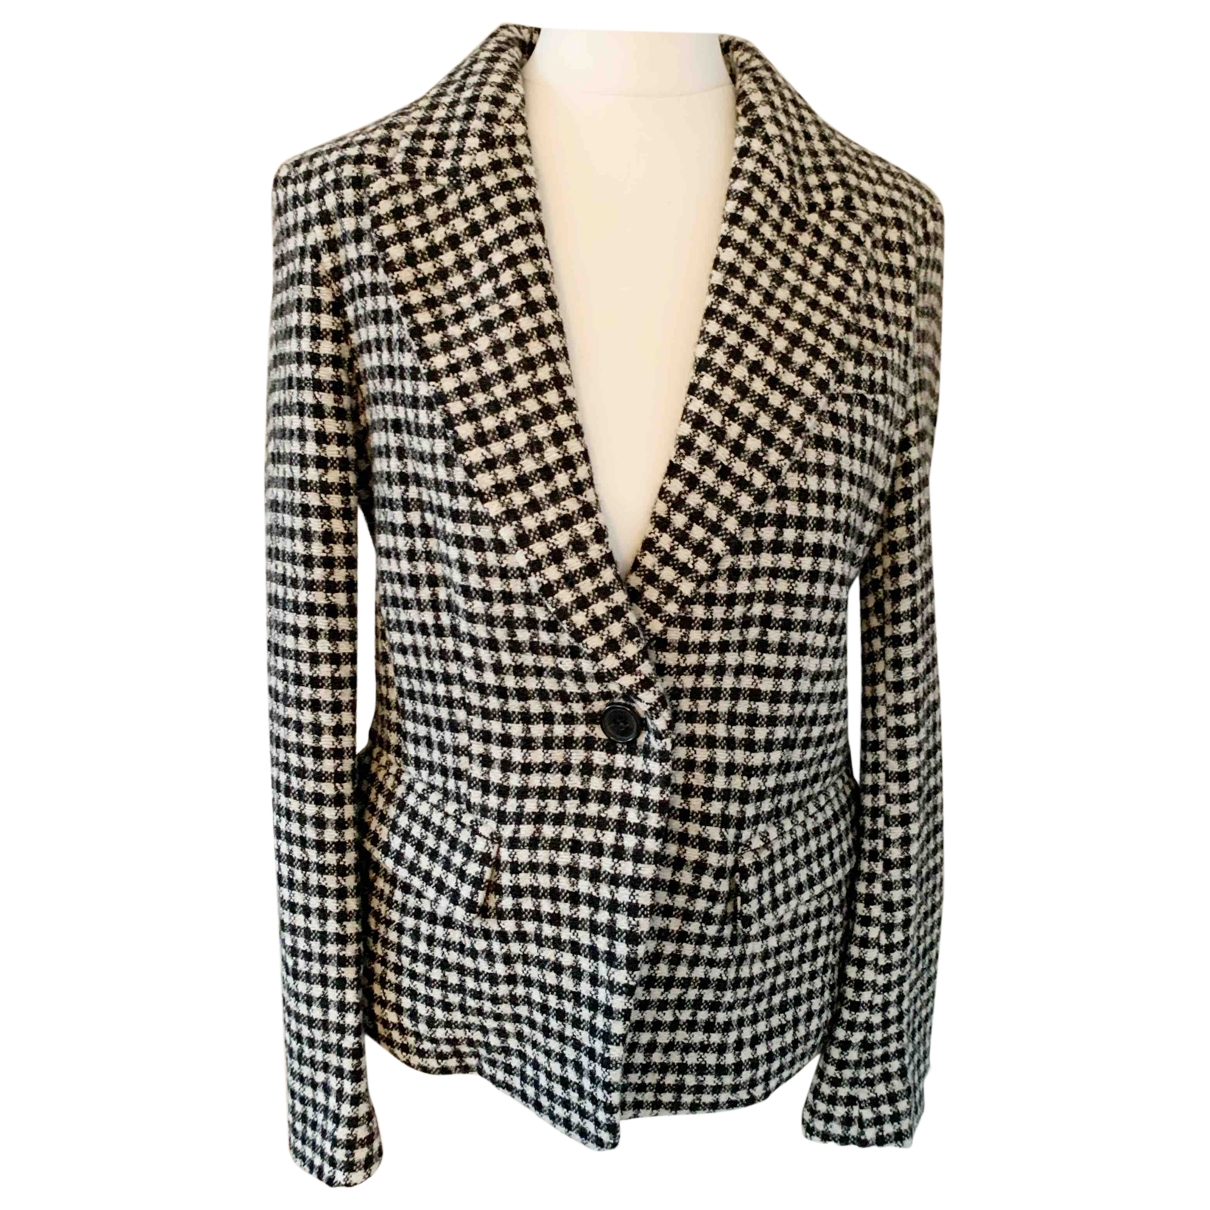 Isabel Marant Etoile \N Black jacket for Women 36 FR